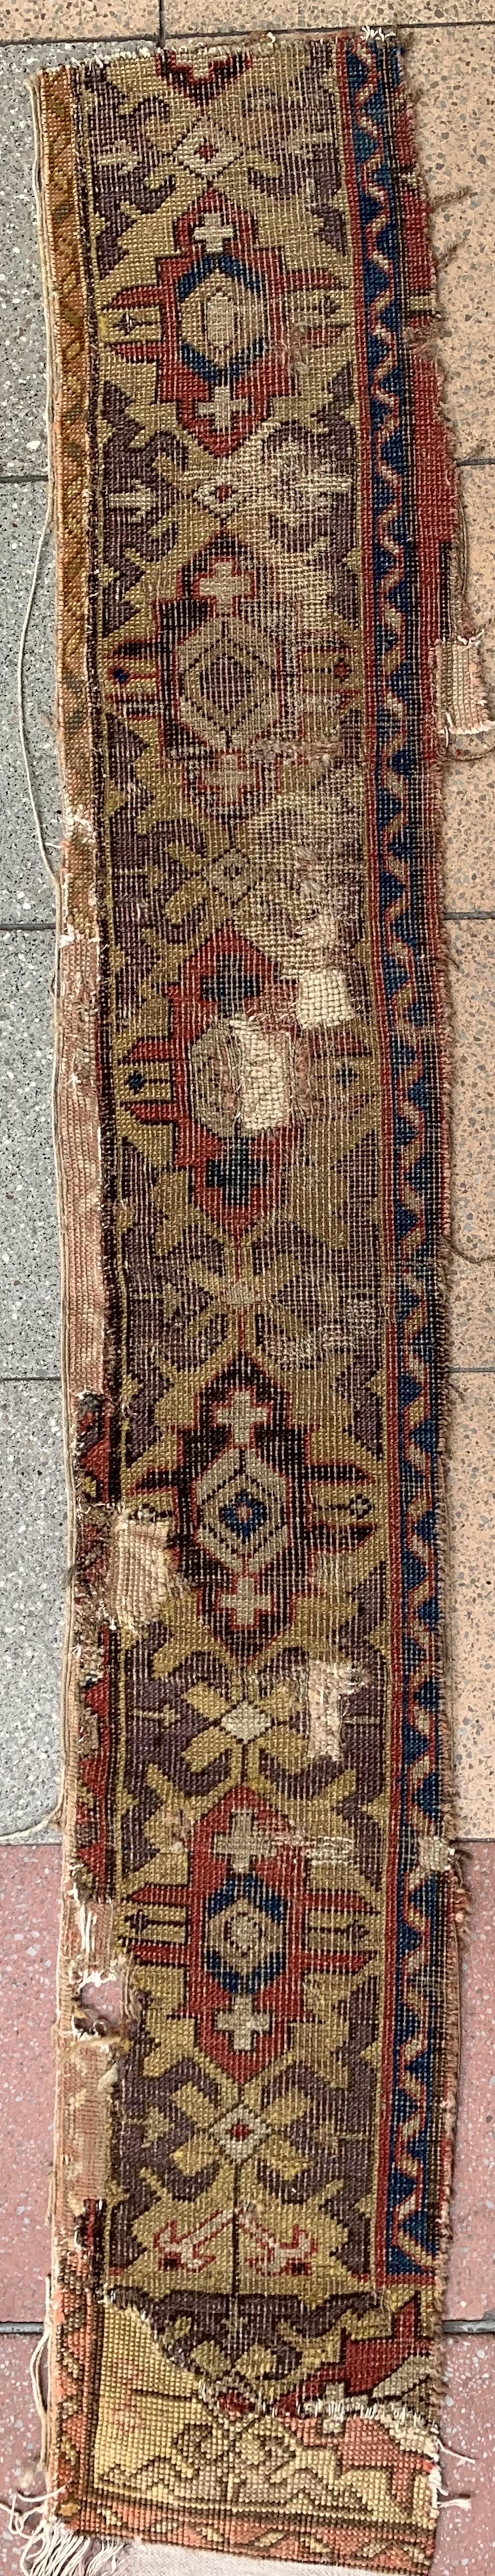 A fragment of a dragon carpet